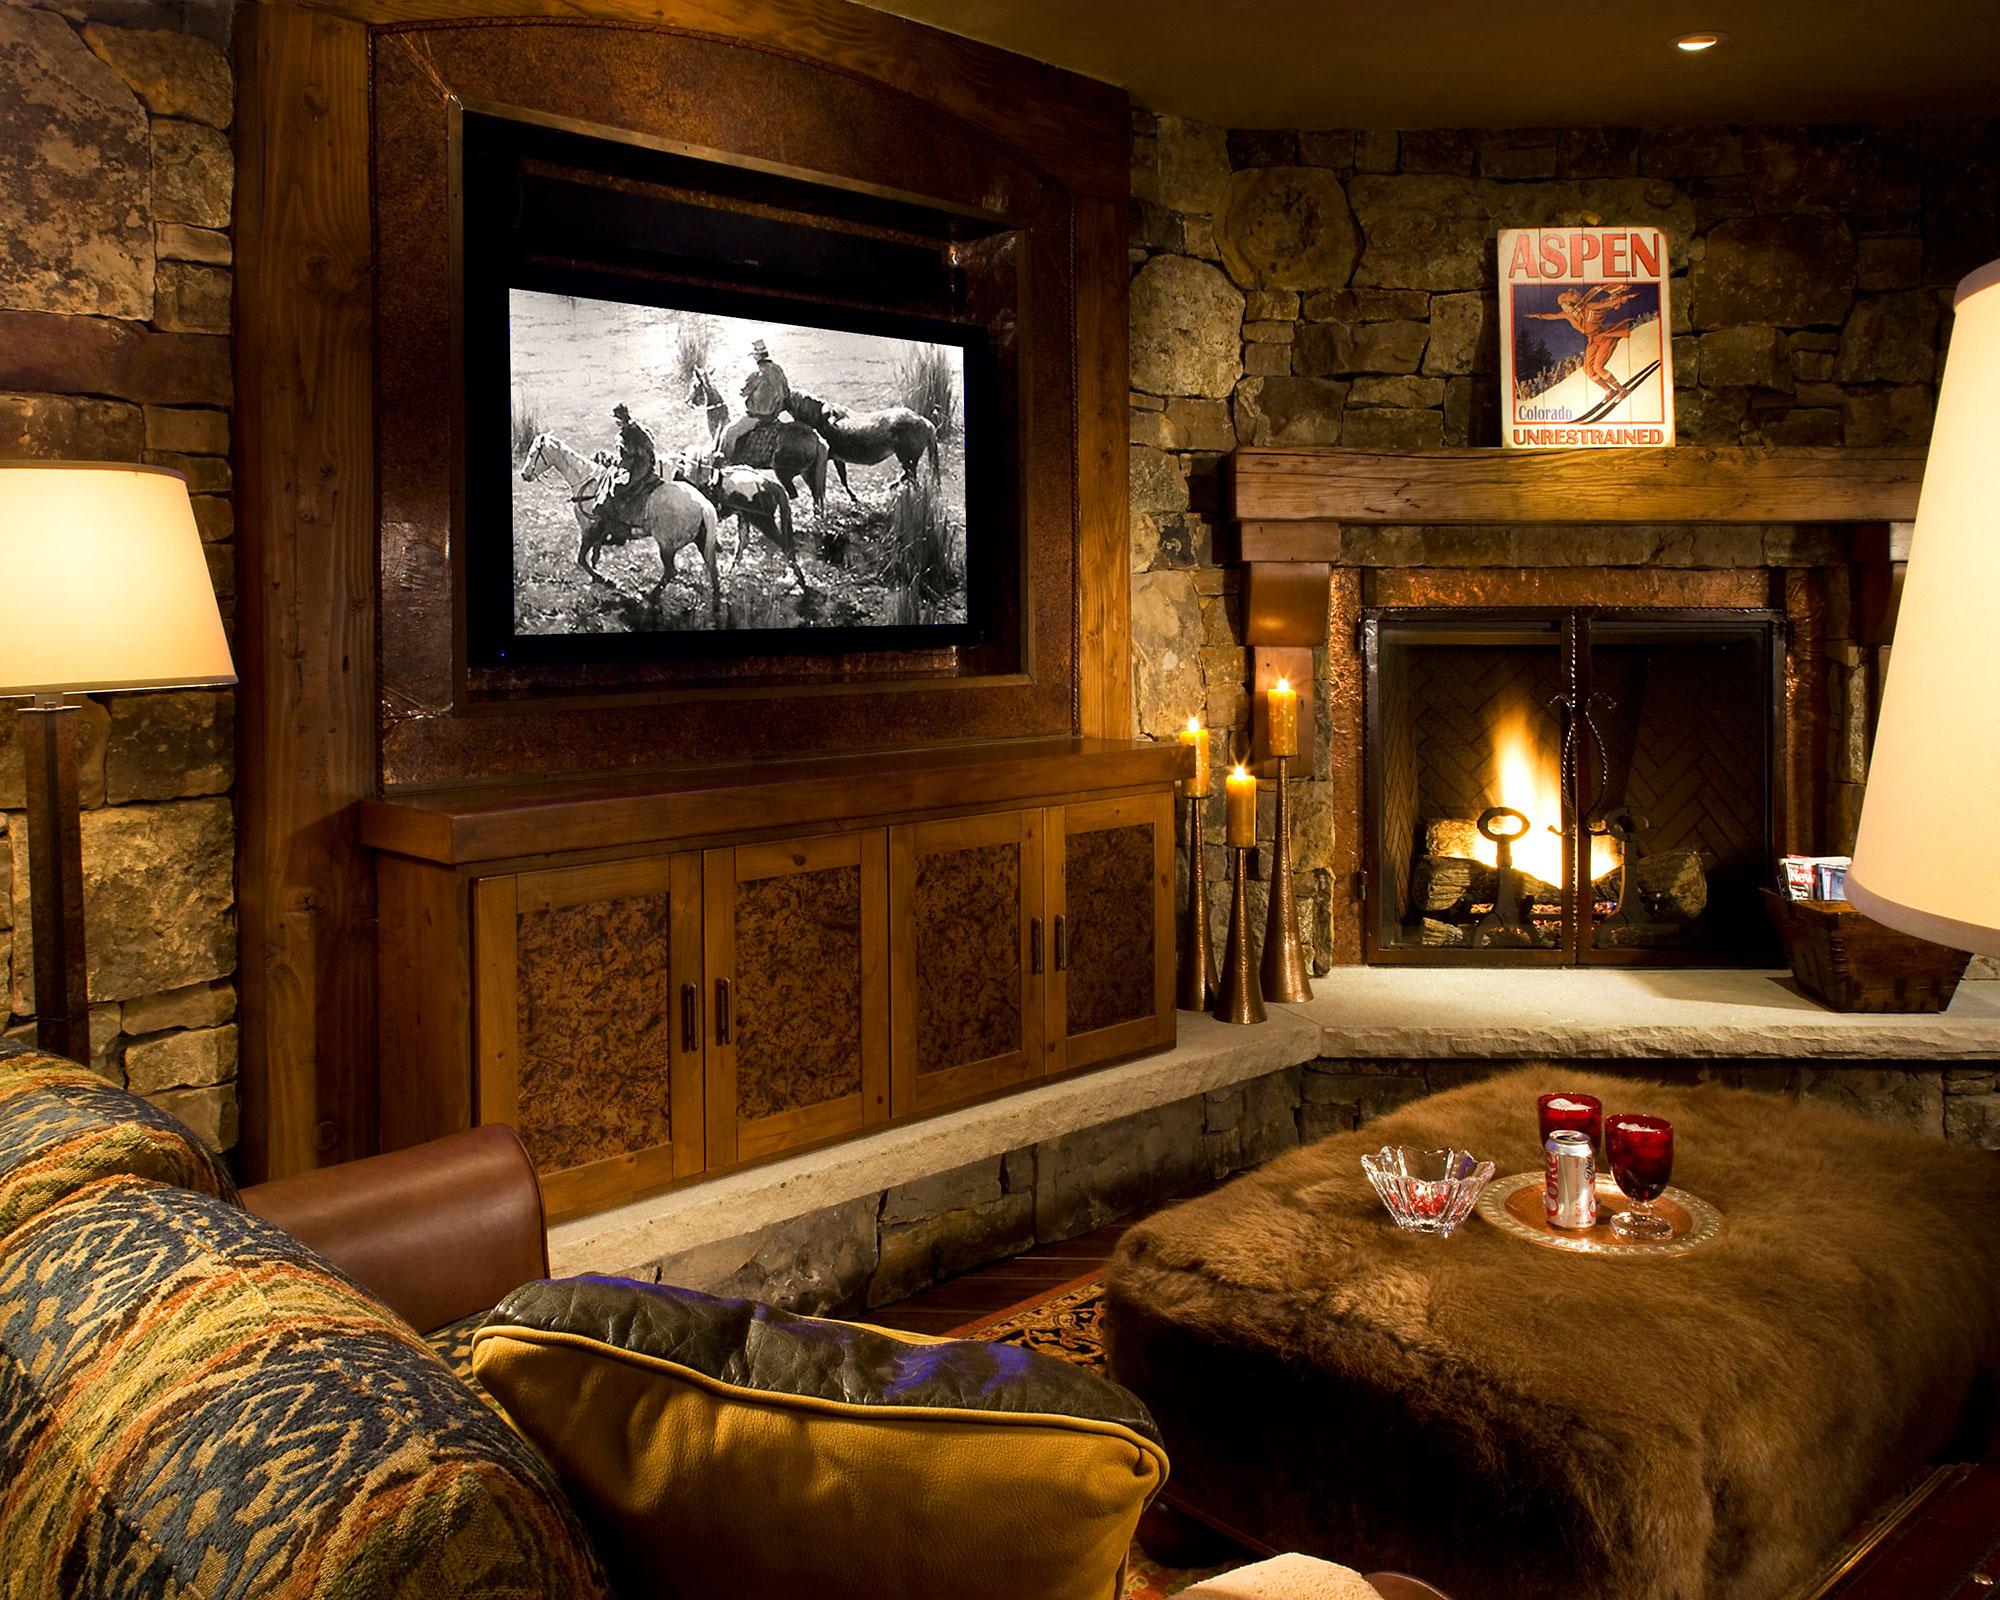 Aspen Highlands Residence Brewster McLeod Architects